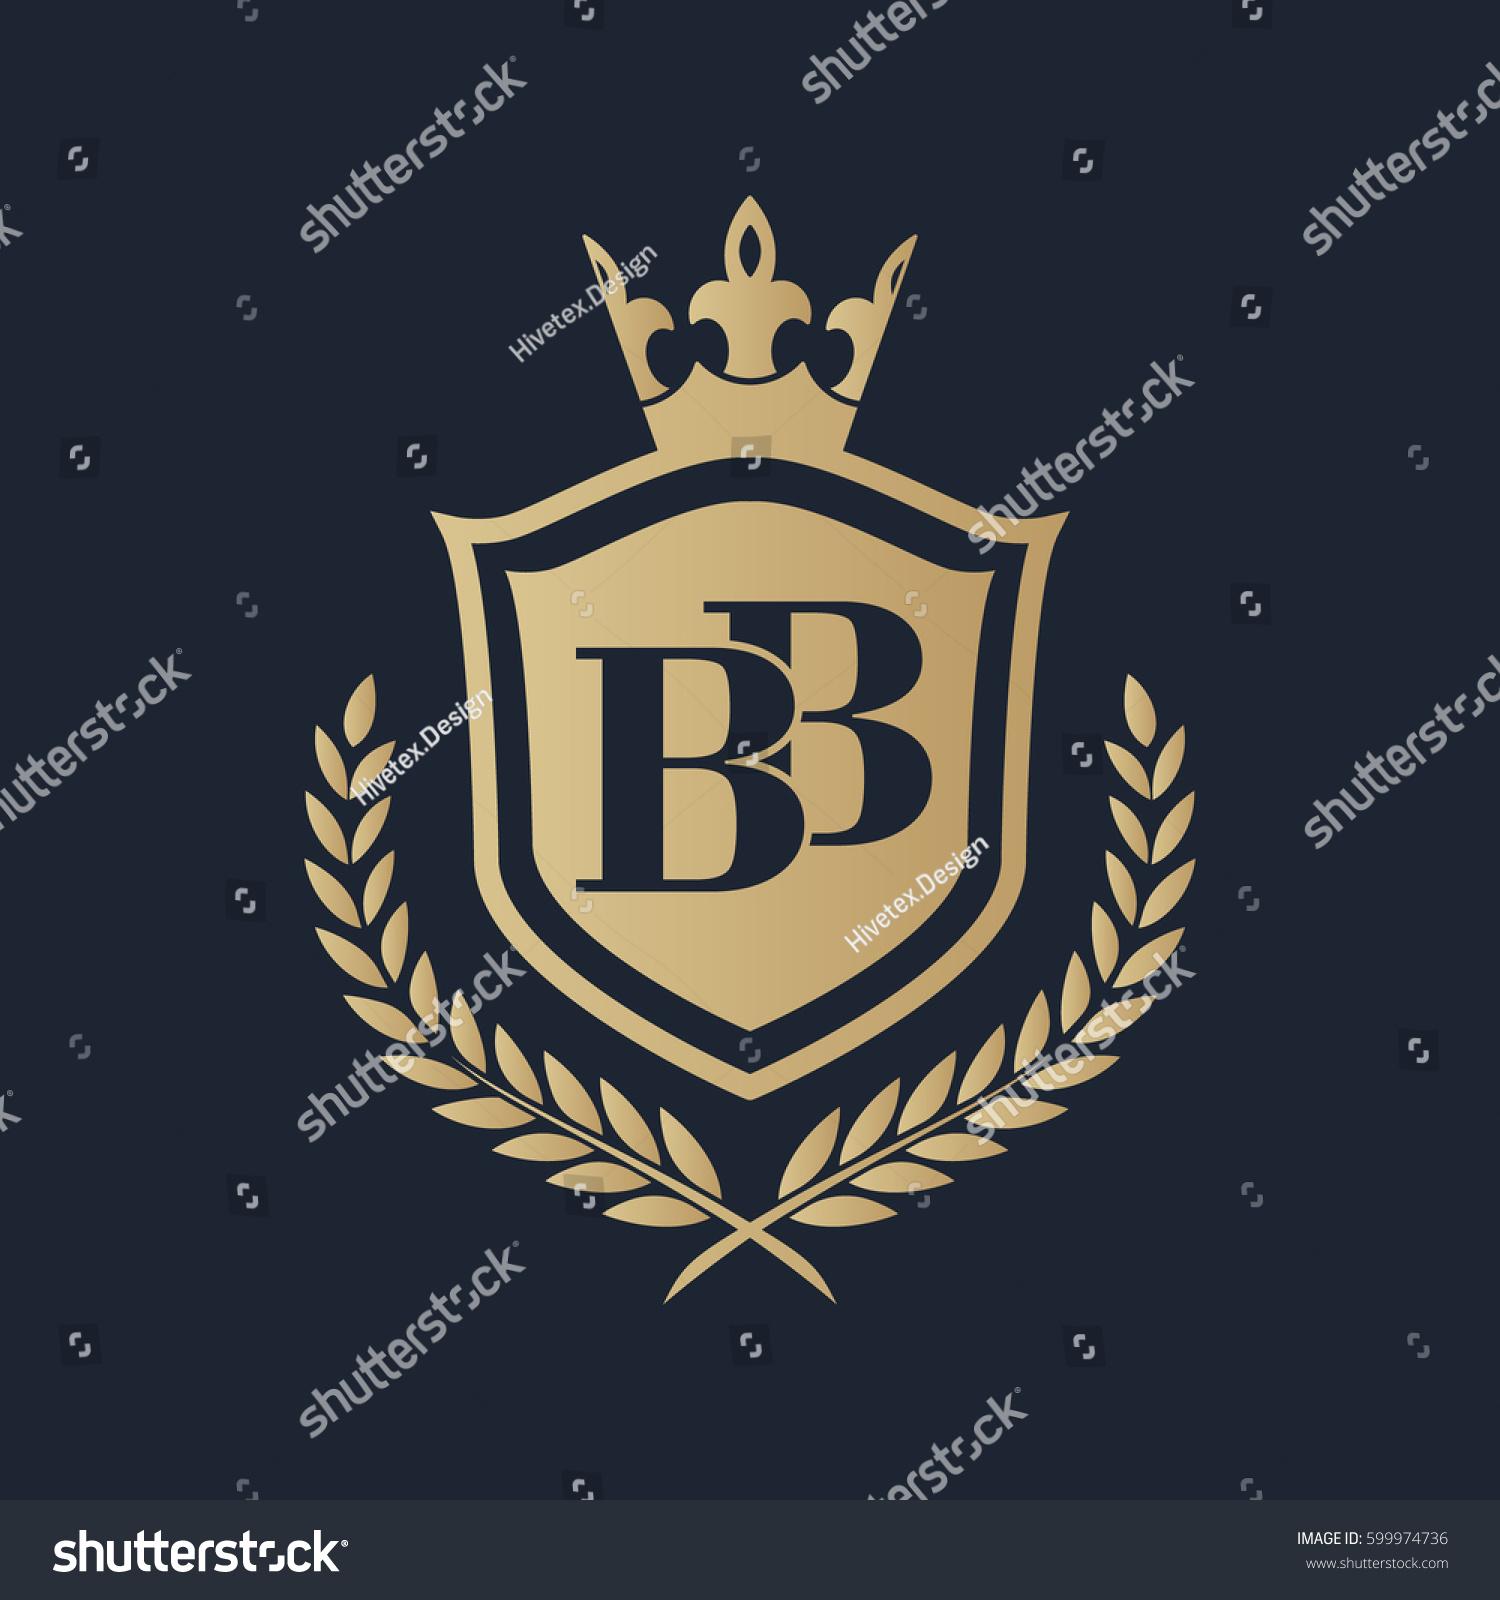 bb logo stock vector royalty free 599974736 shutterstock